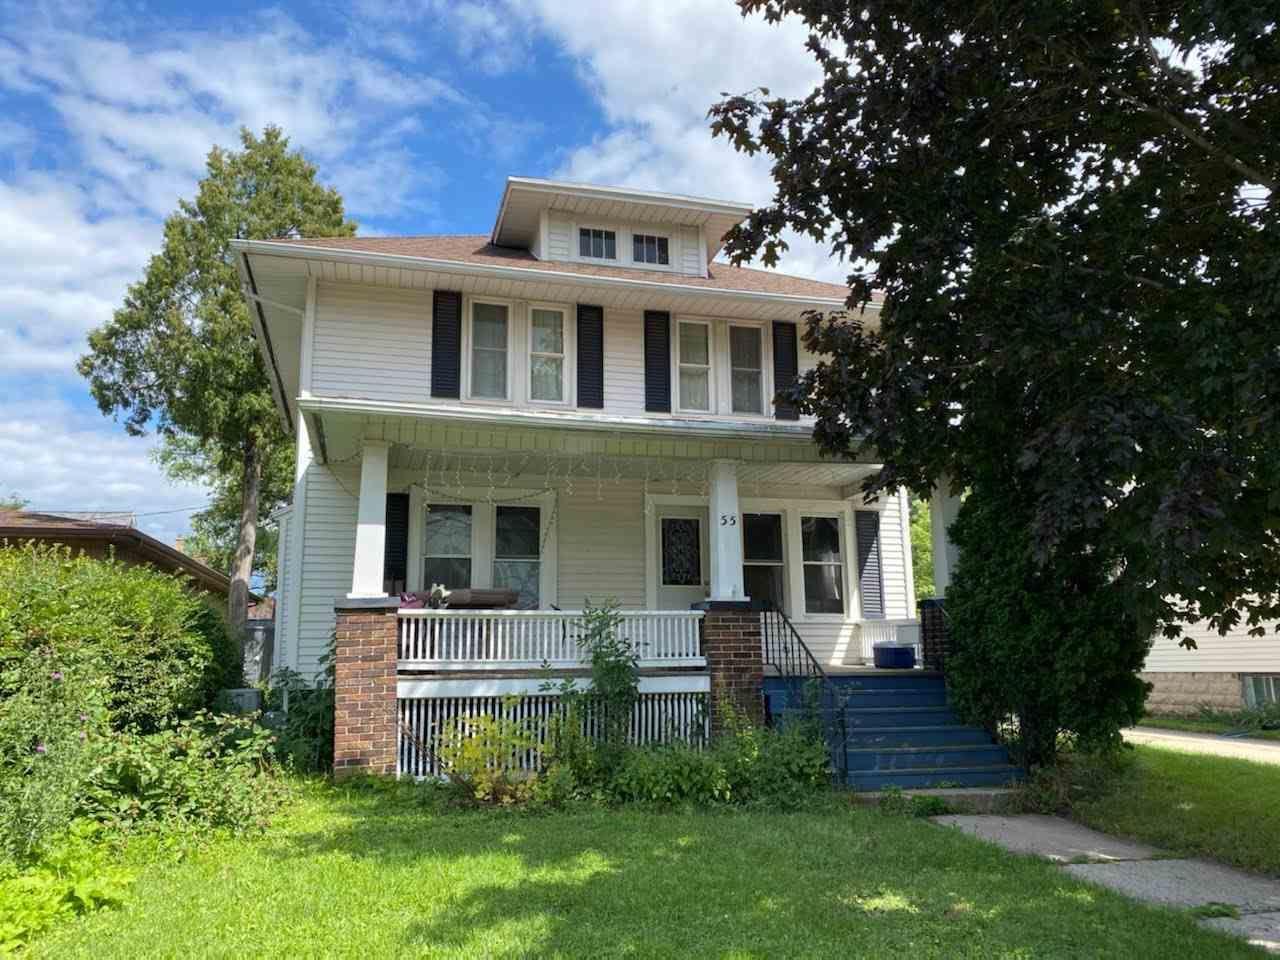 55 CHAMPION Avenue, Fond du Lac, WI 54935 - MLS#: 50232944